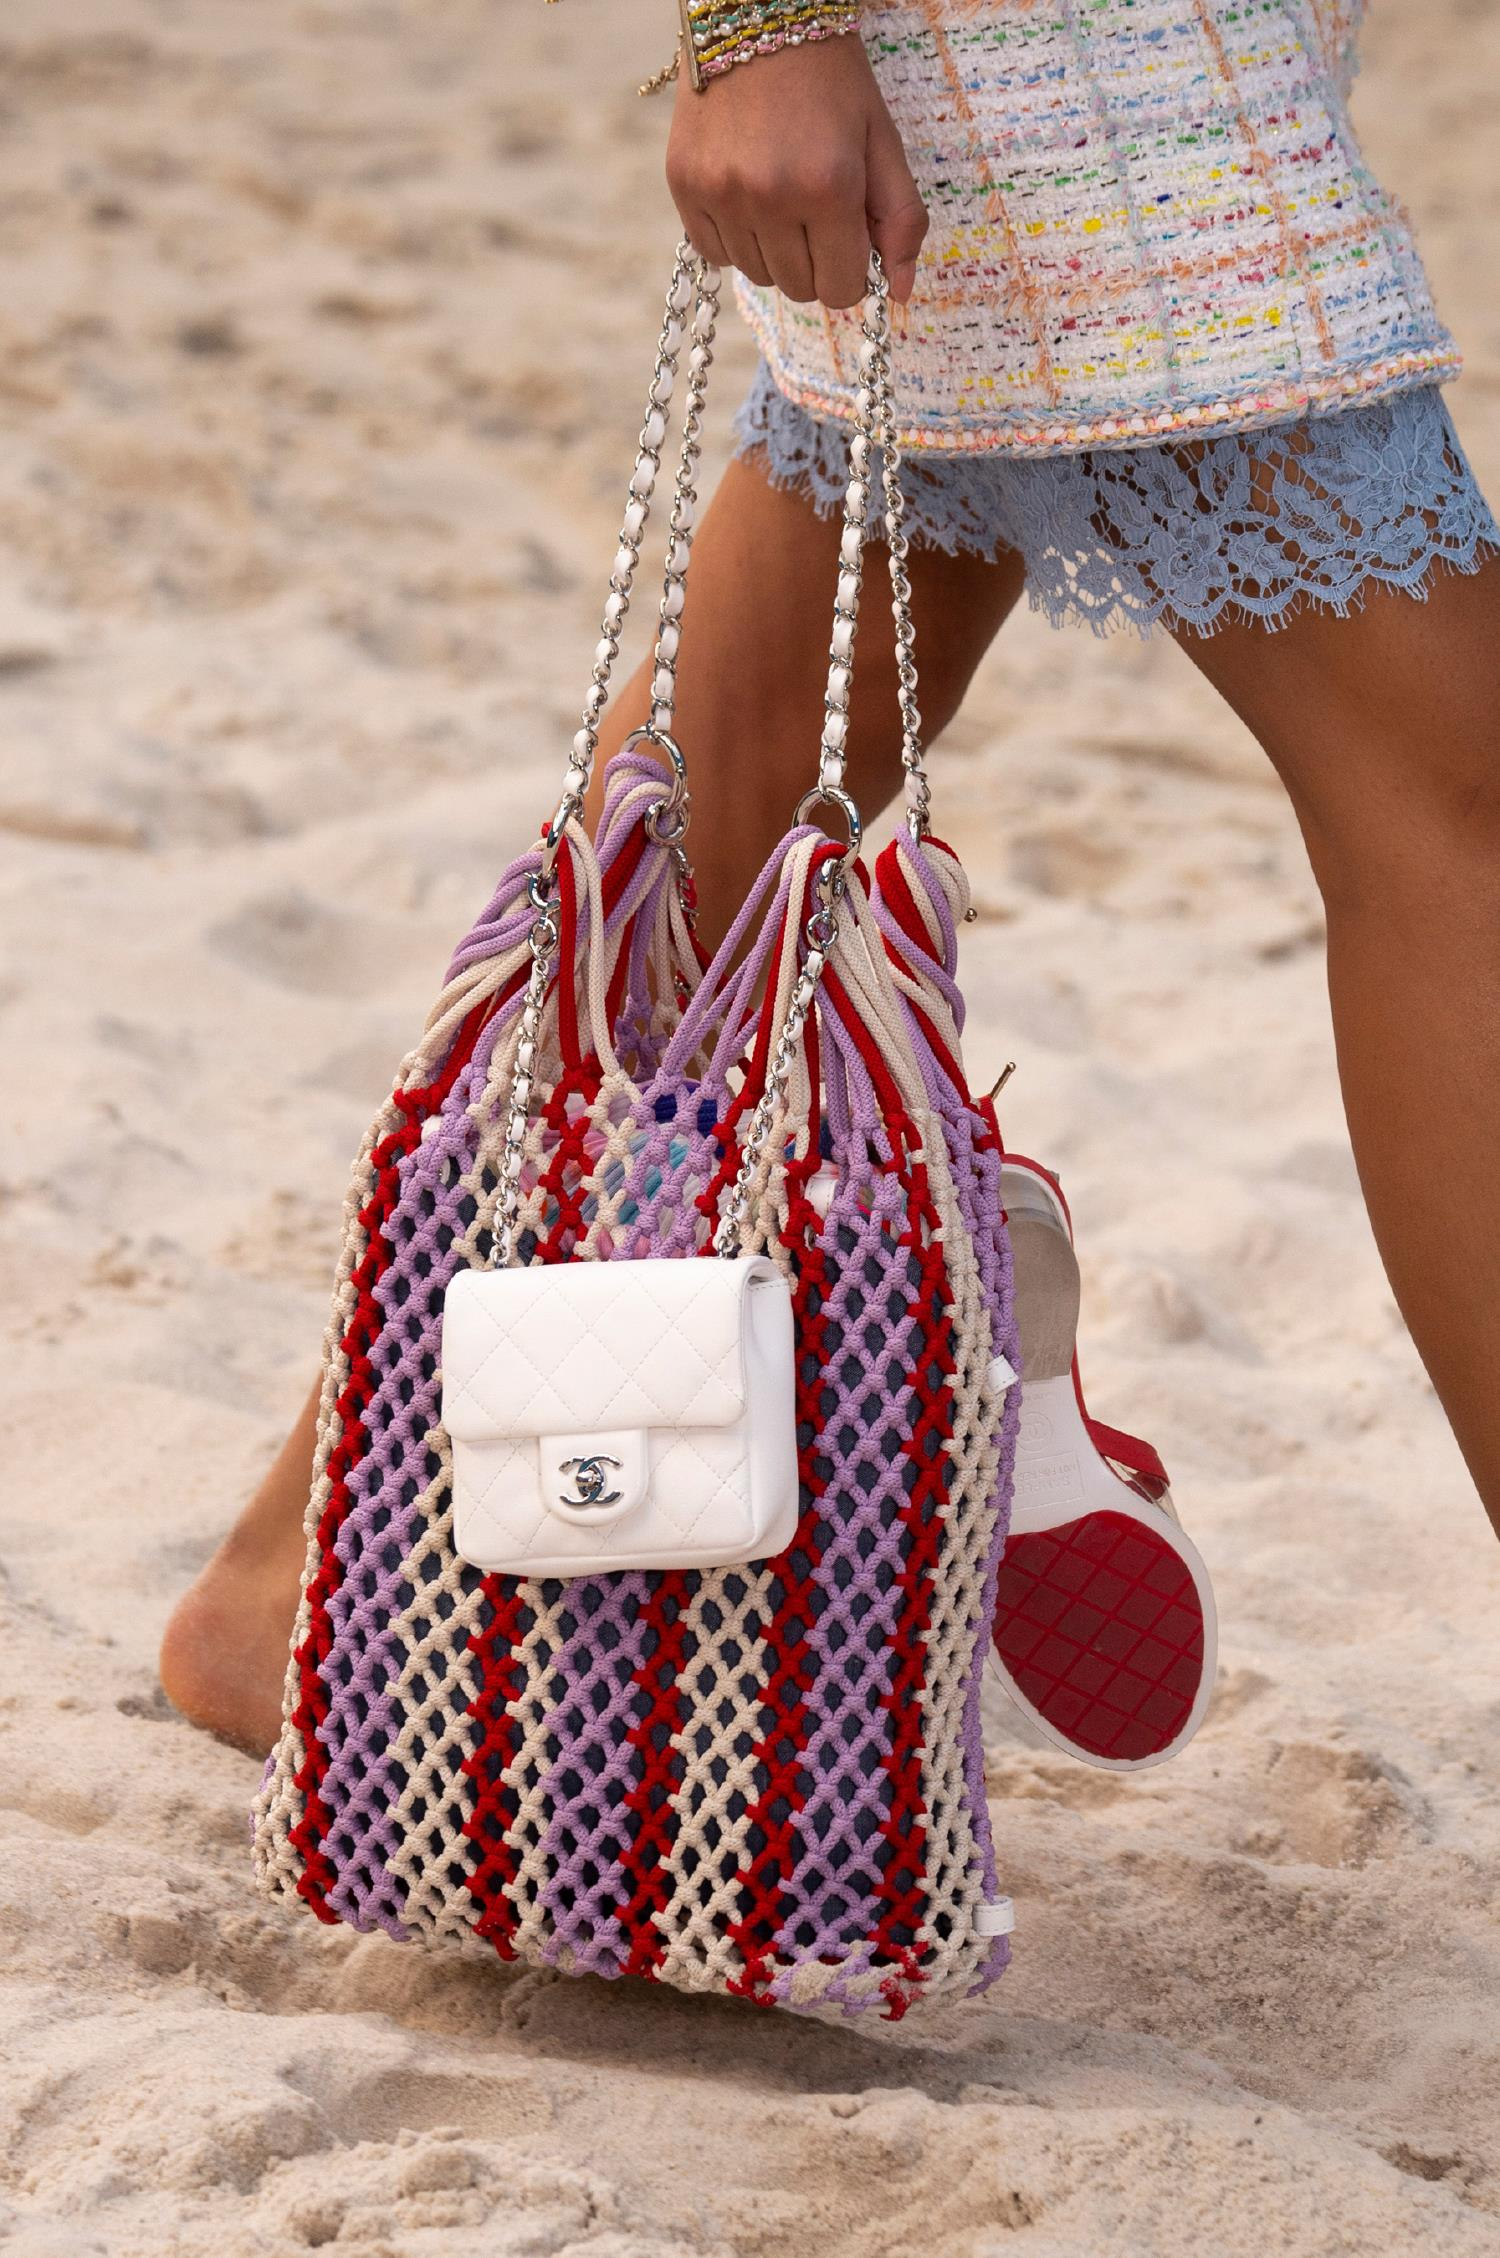 57038d3675 Η αλήθεια είναι ότι αγαπώ το καλοκαίρι για πάρα πολλούς λόγους… Τώρα όμως  έχω ακόμα έναν λόγο…Τις αγαπώ αυτές τις τσάντες.